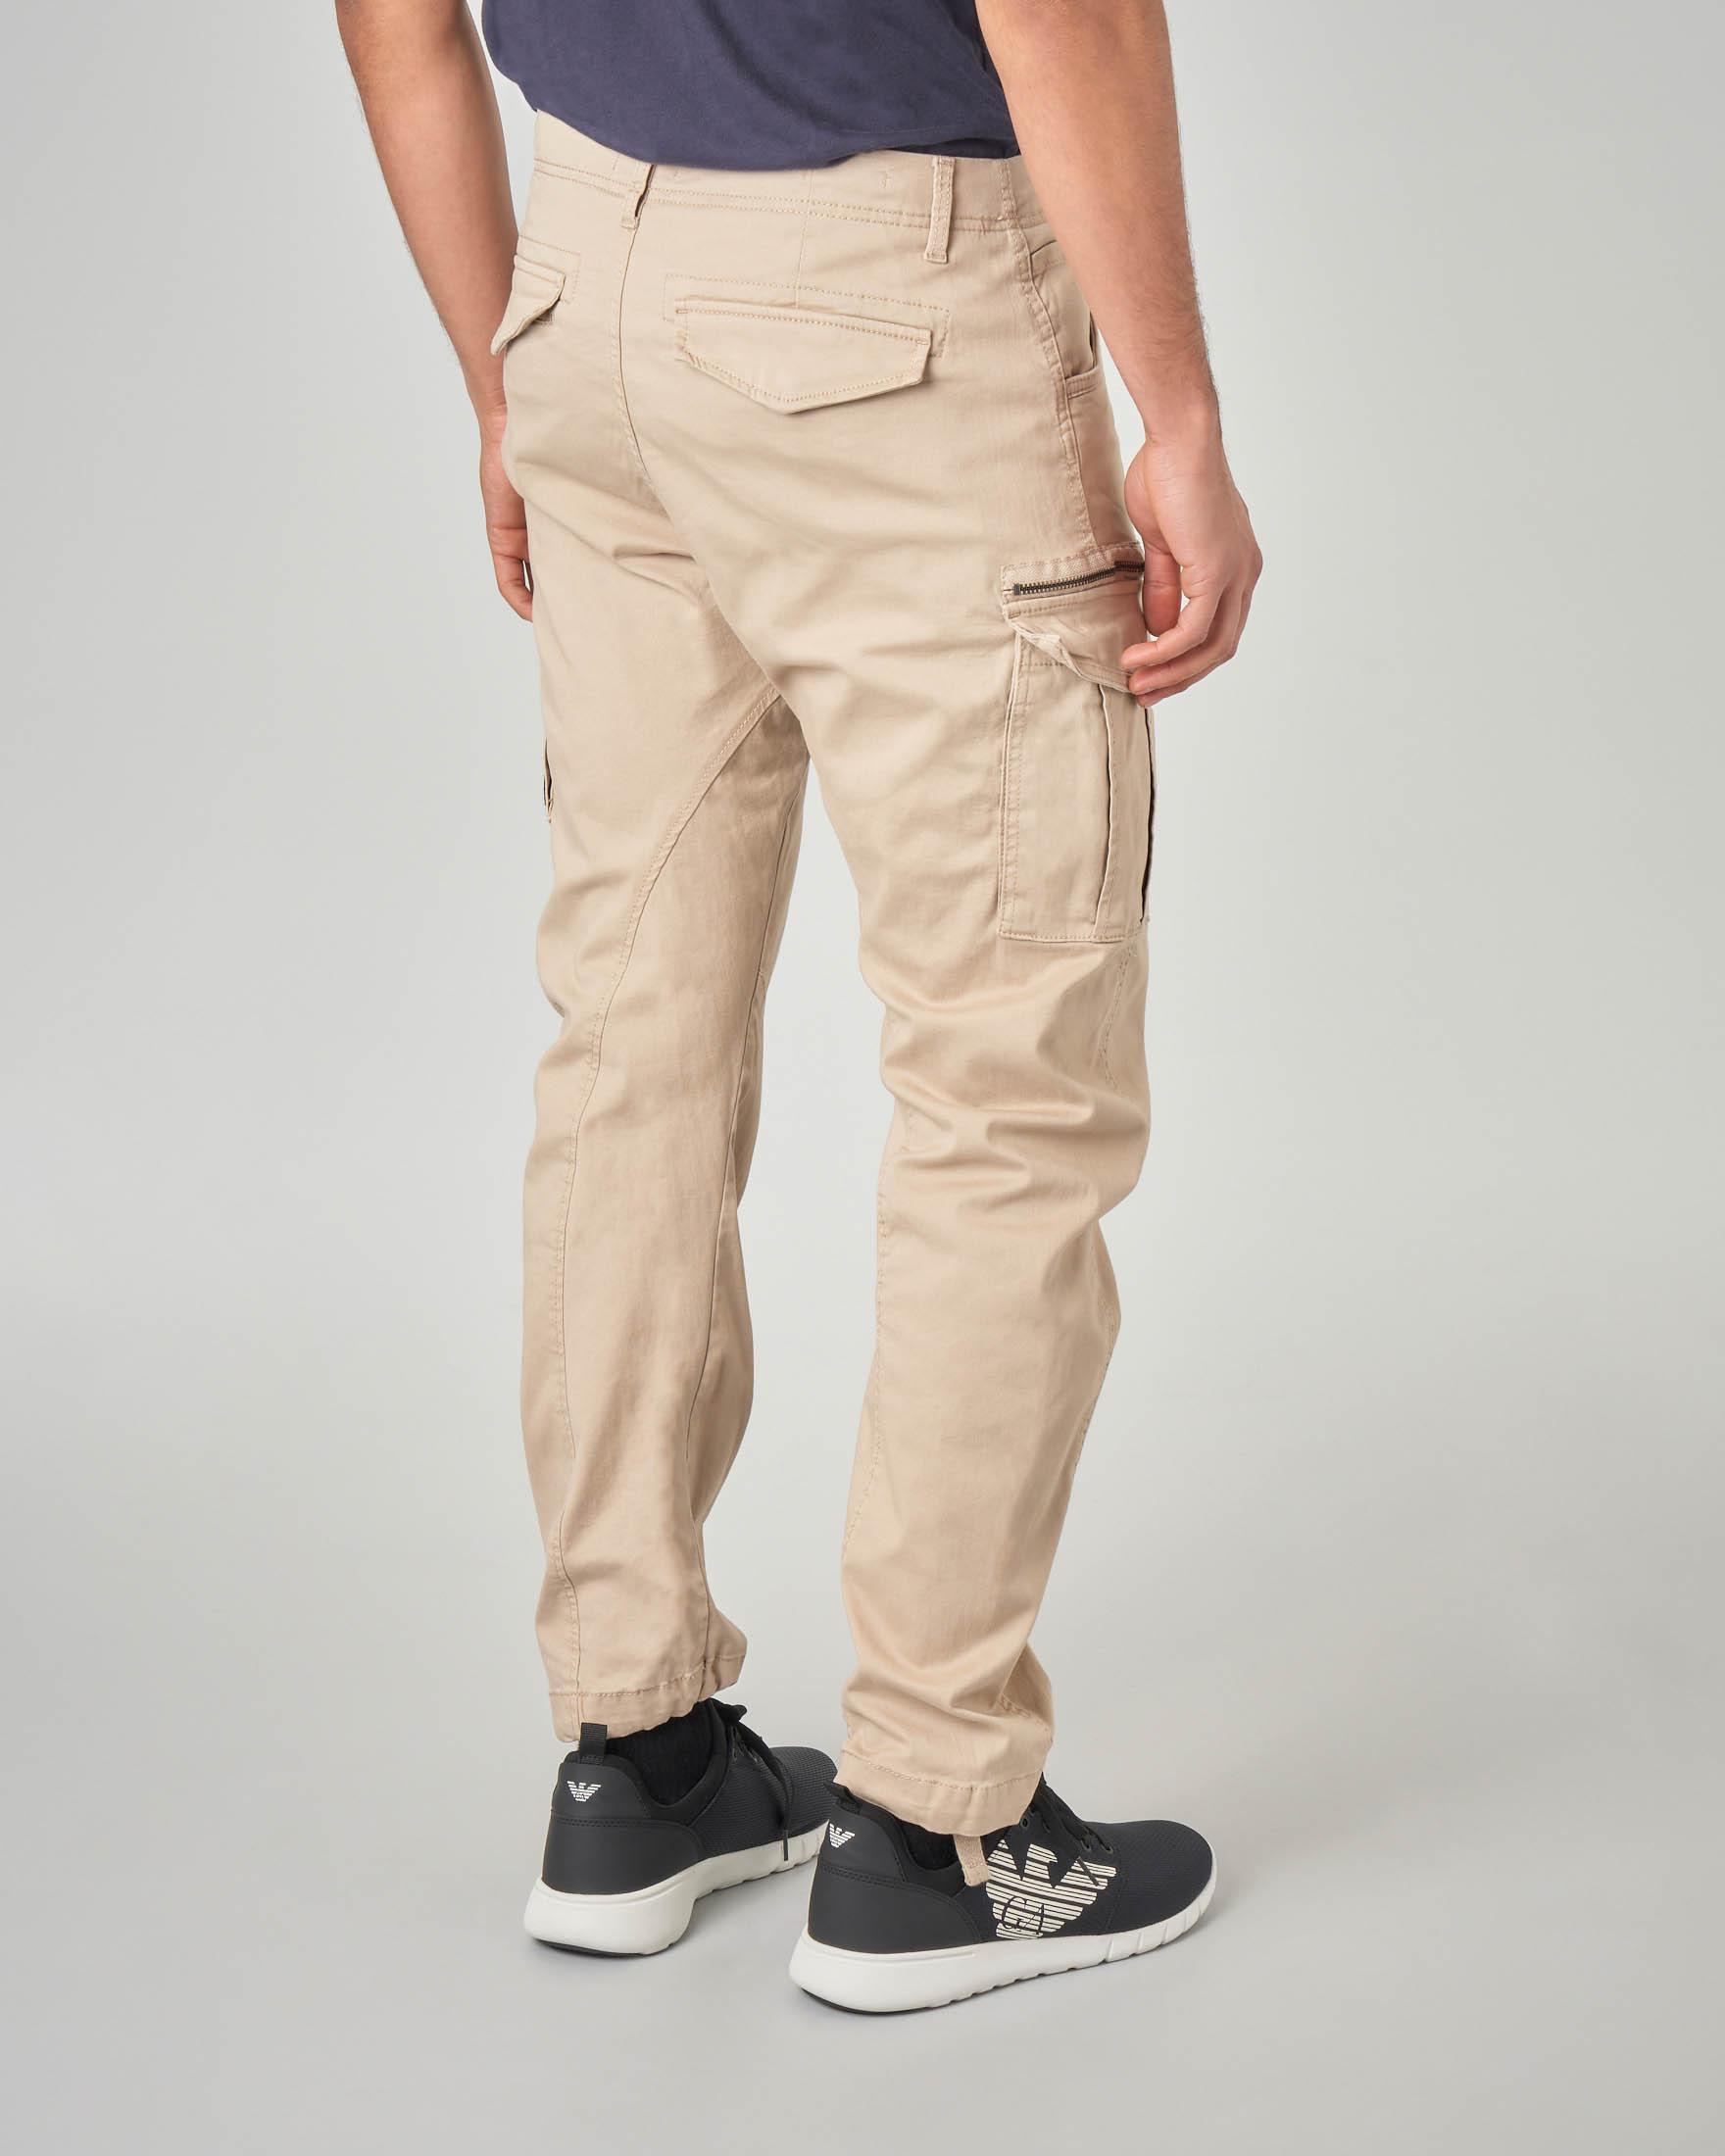 Pantaloni cargo color sabbia